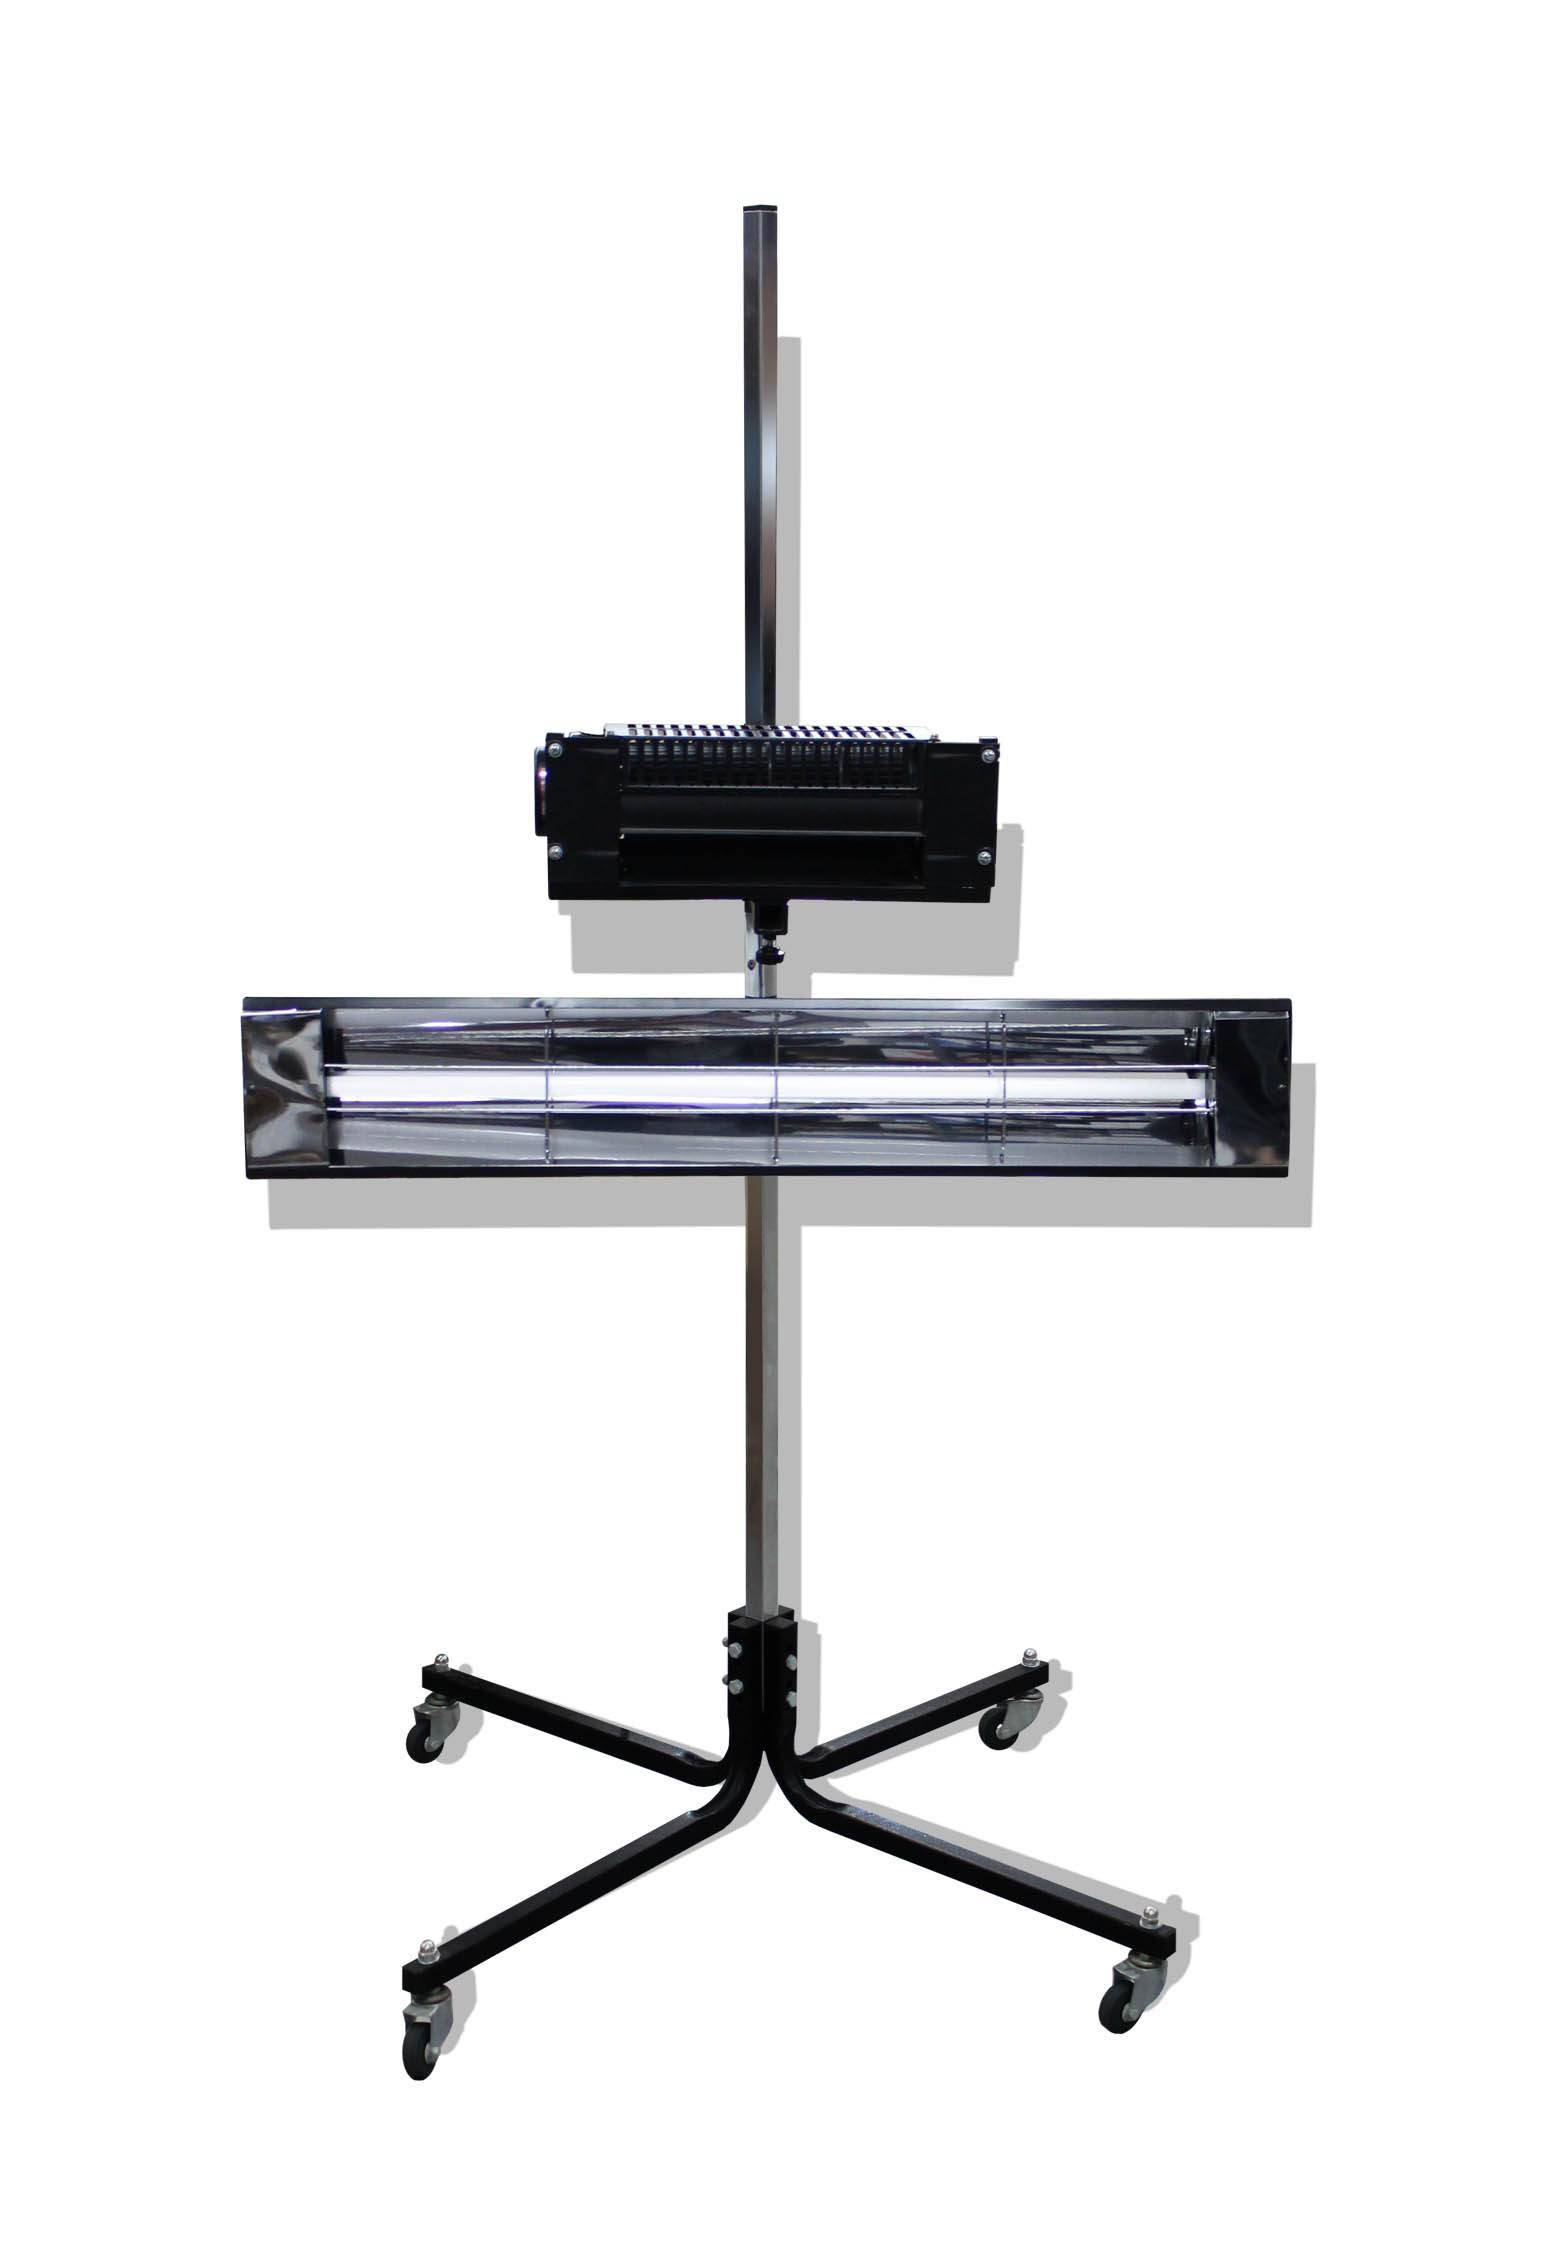 Medium Wave Infrared Lamp With Fan Pro Teksprayequipment Com